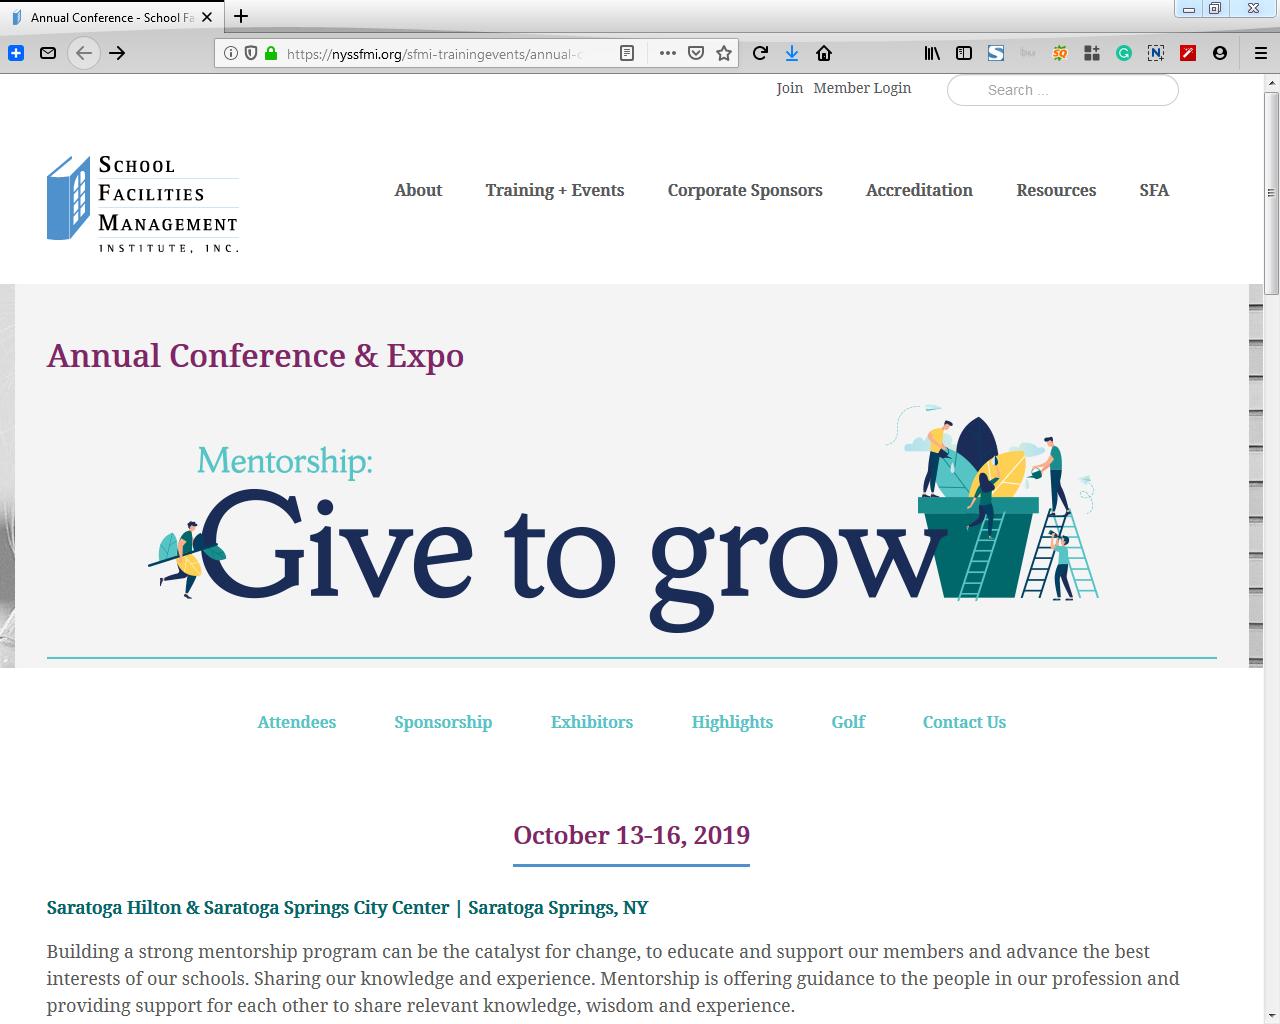 School Facility Management Conference & Expo 2019 - Saratoga Hilton & Saratoga Springs City Center, 534 Broadway, Saratoga Springs, NY 12866